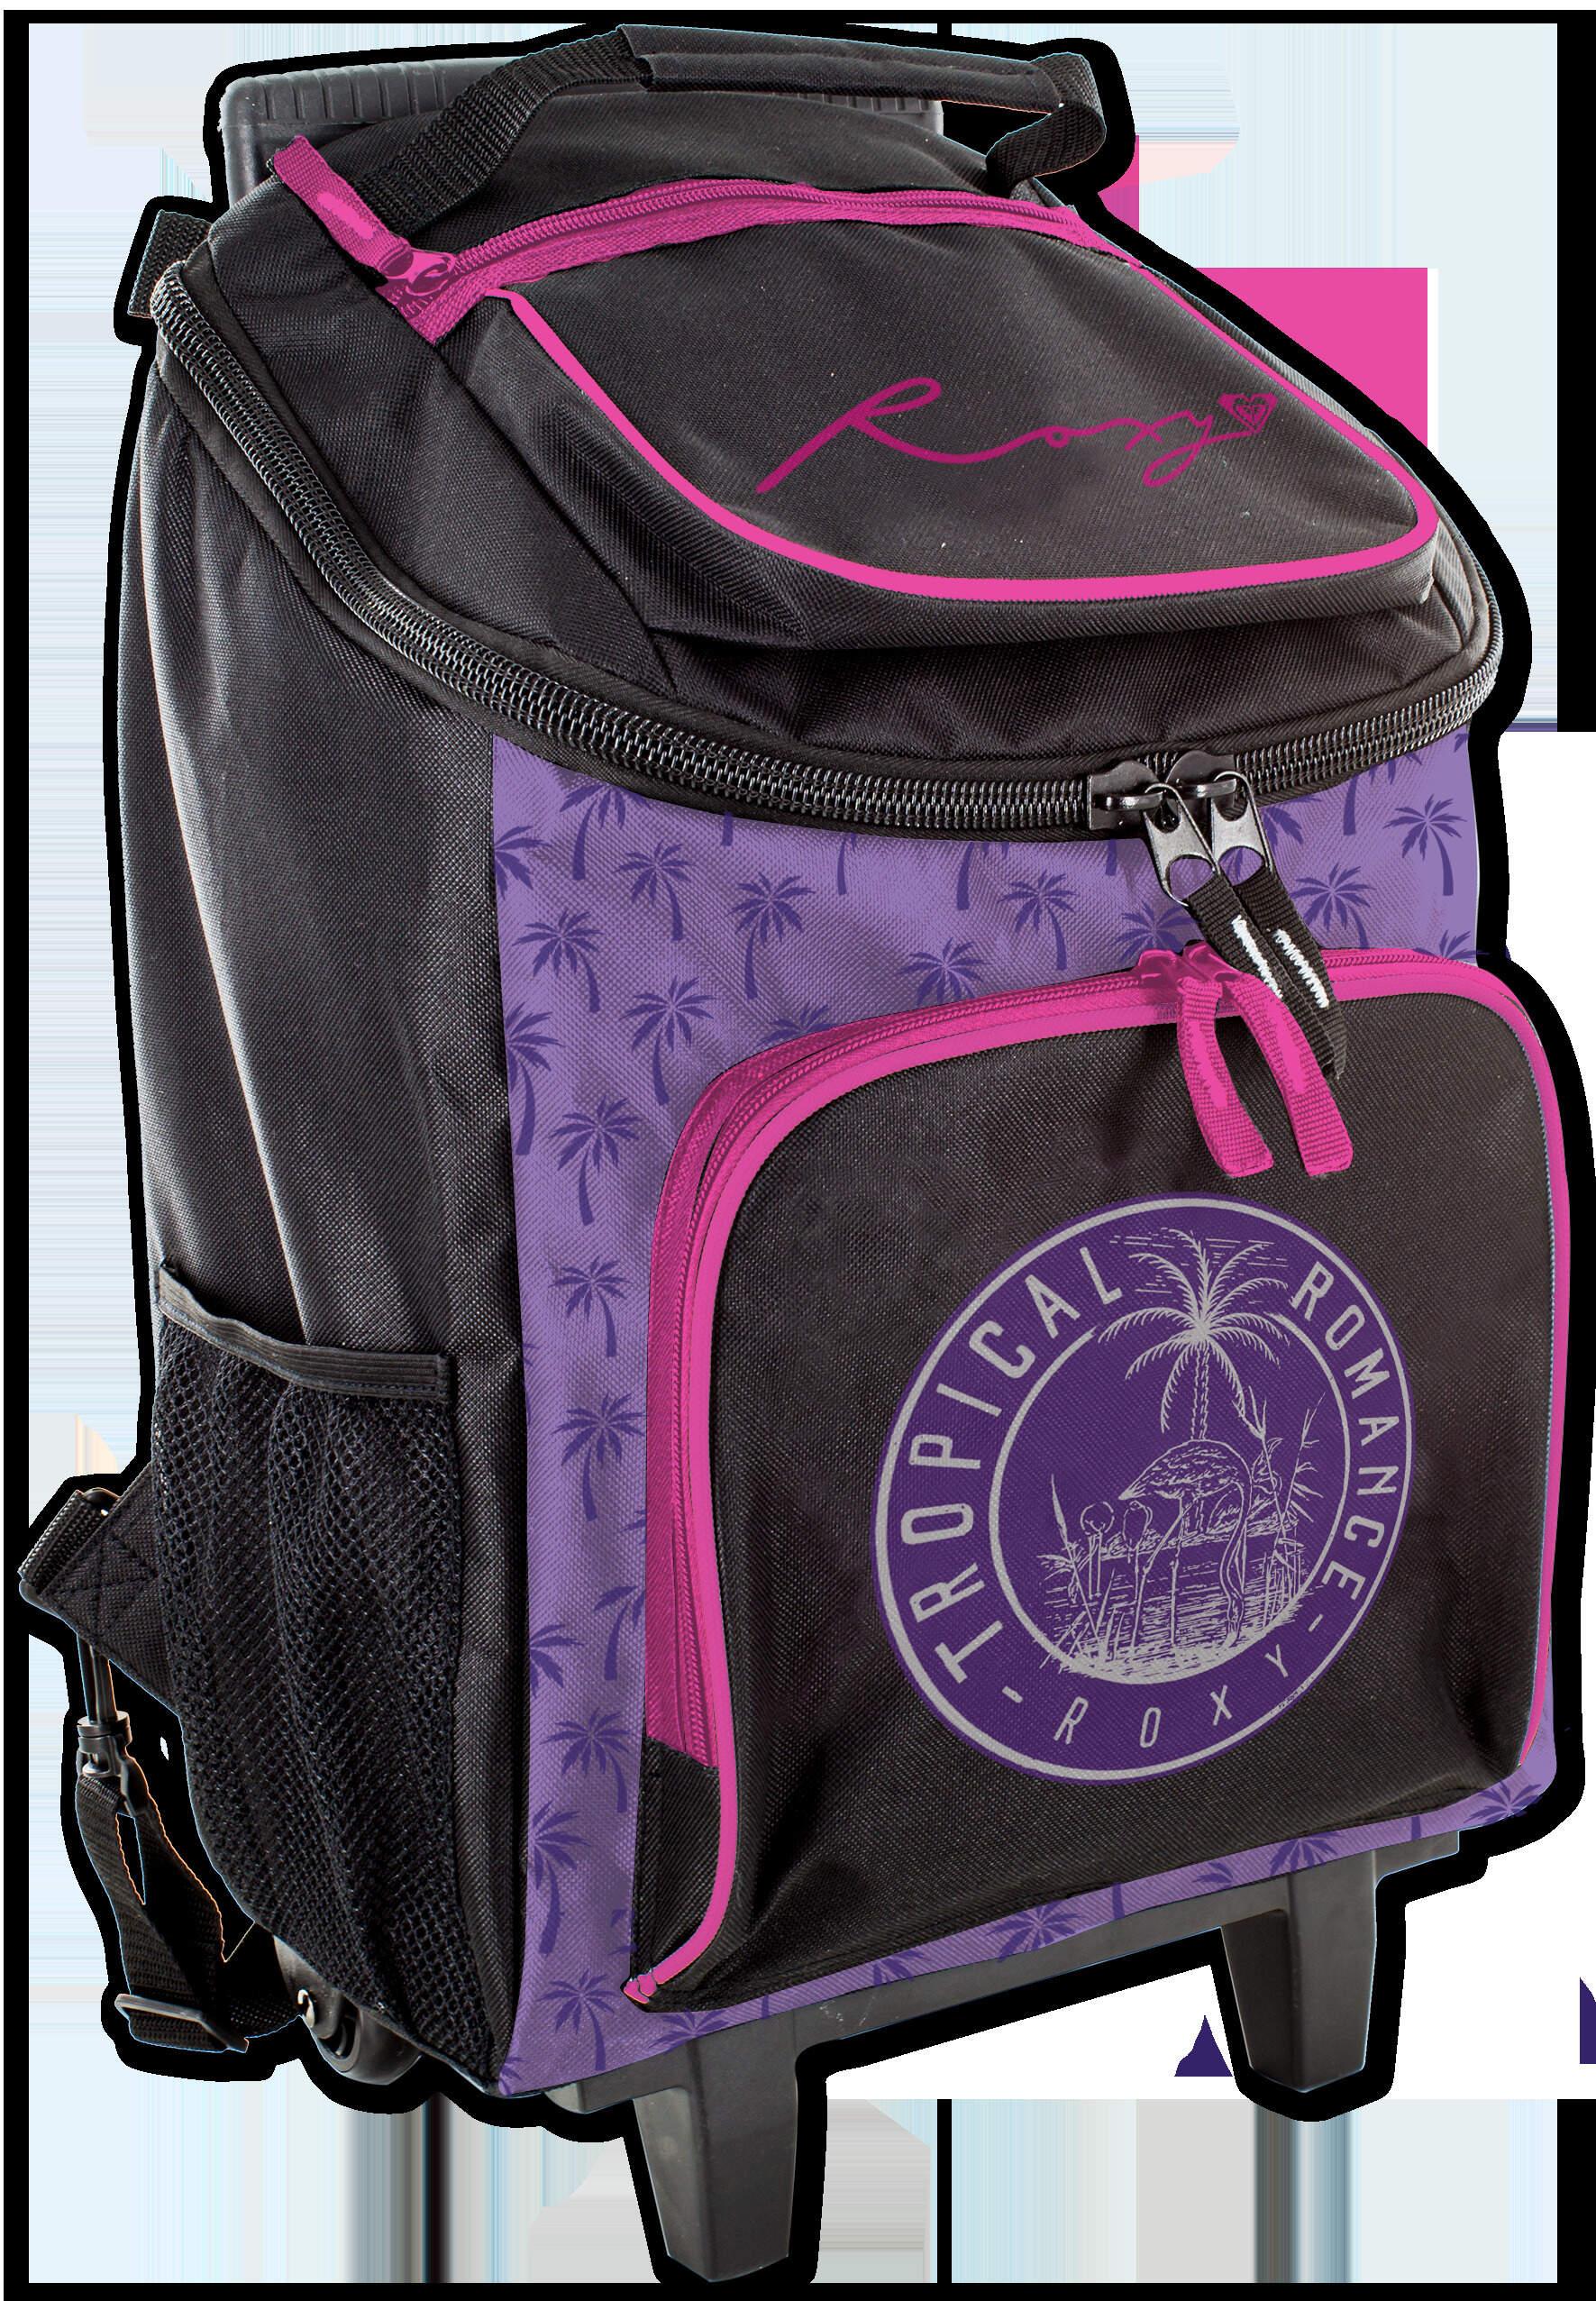 Roxy Trolley Bag - Play Time Wheelie